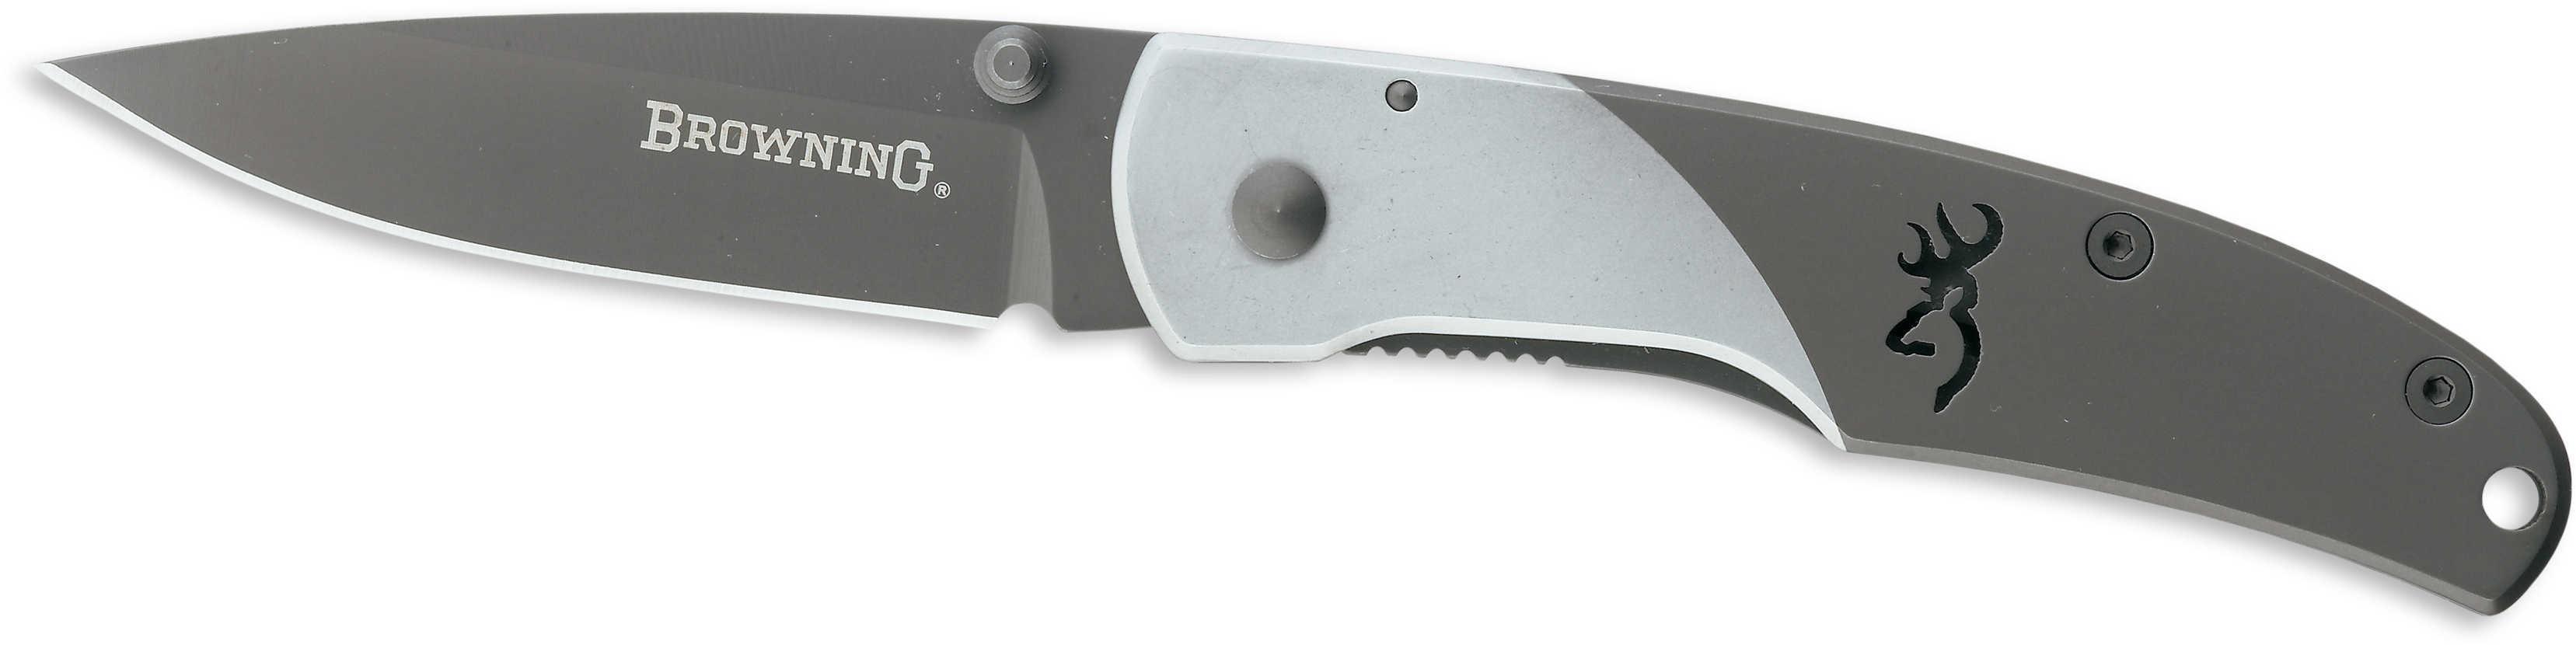 Browning Mountain Ti Folding Knife Medium, Box Md: 322560B